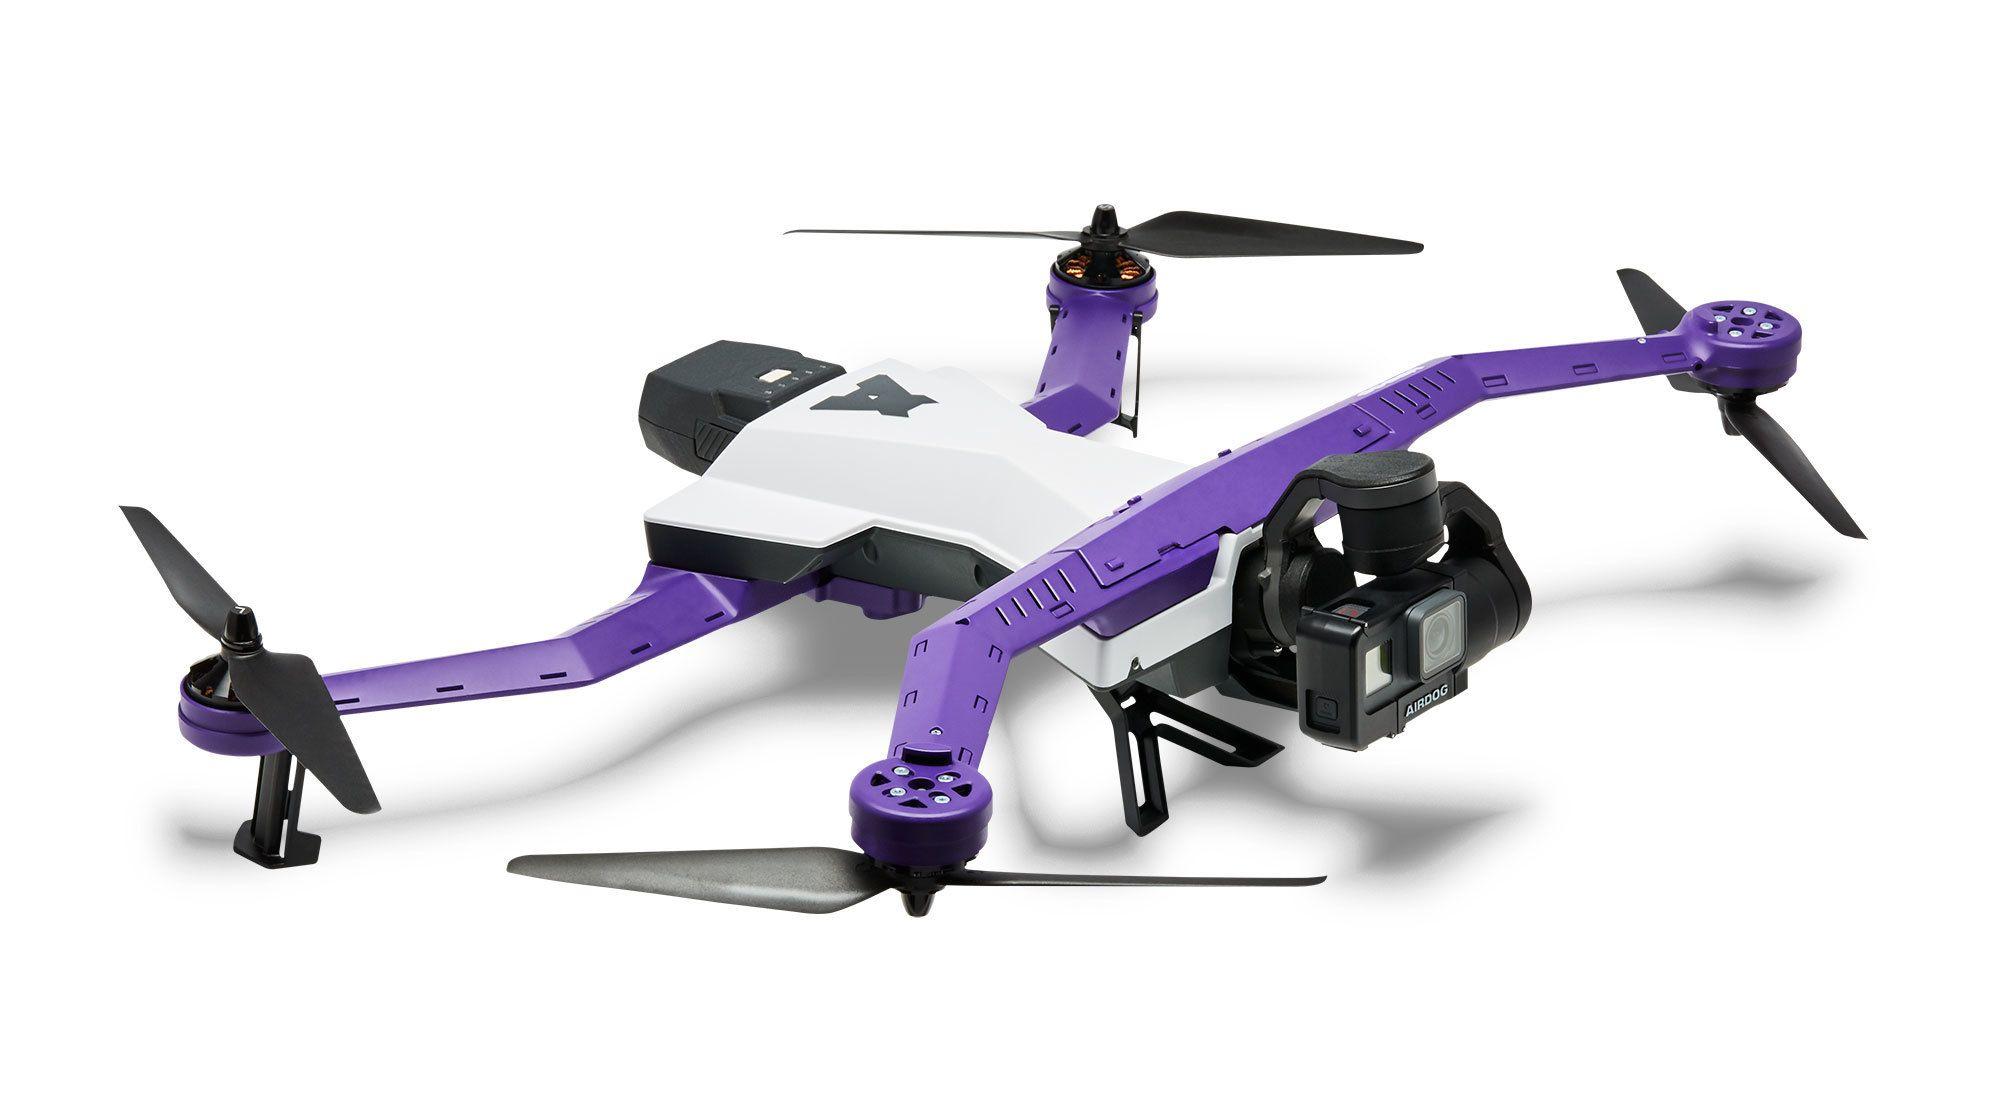 Dronen i fullfigur.